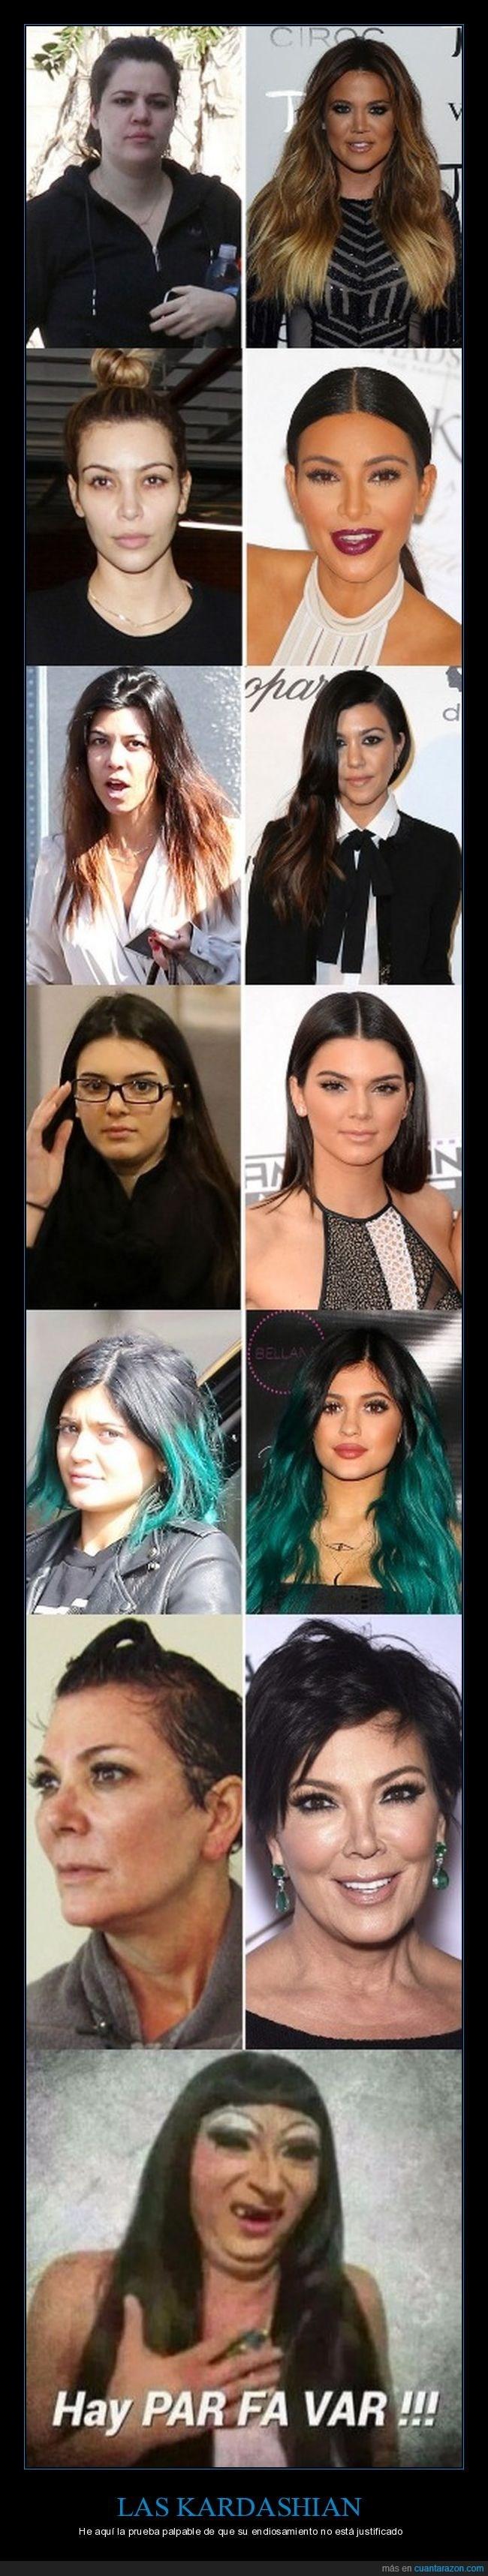 las Kardashian sin maquillaje son chicas del monton